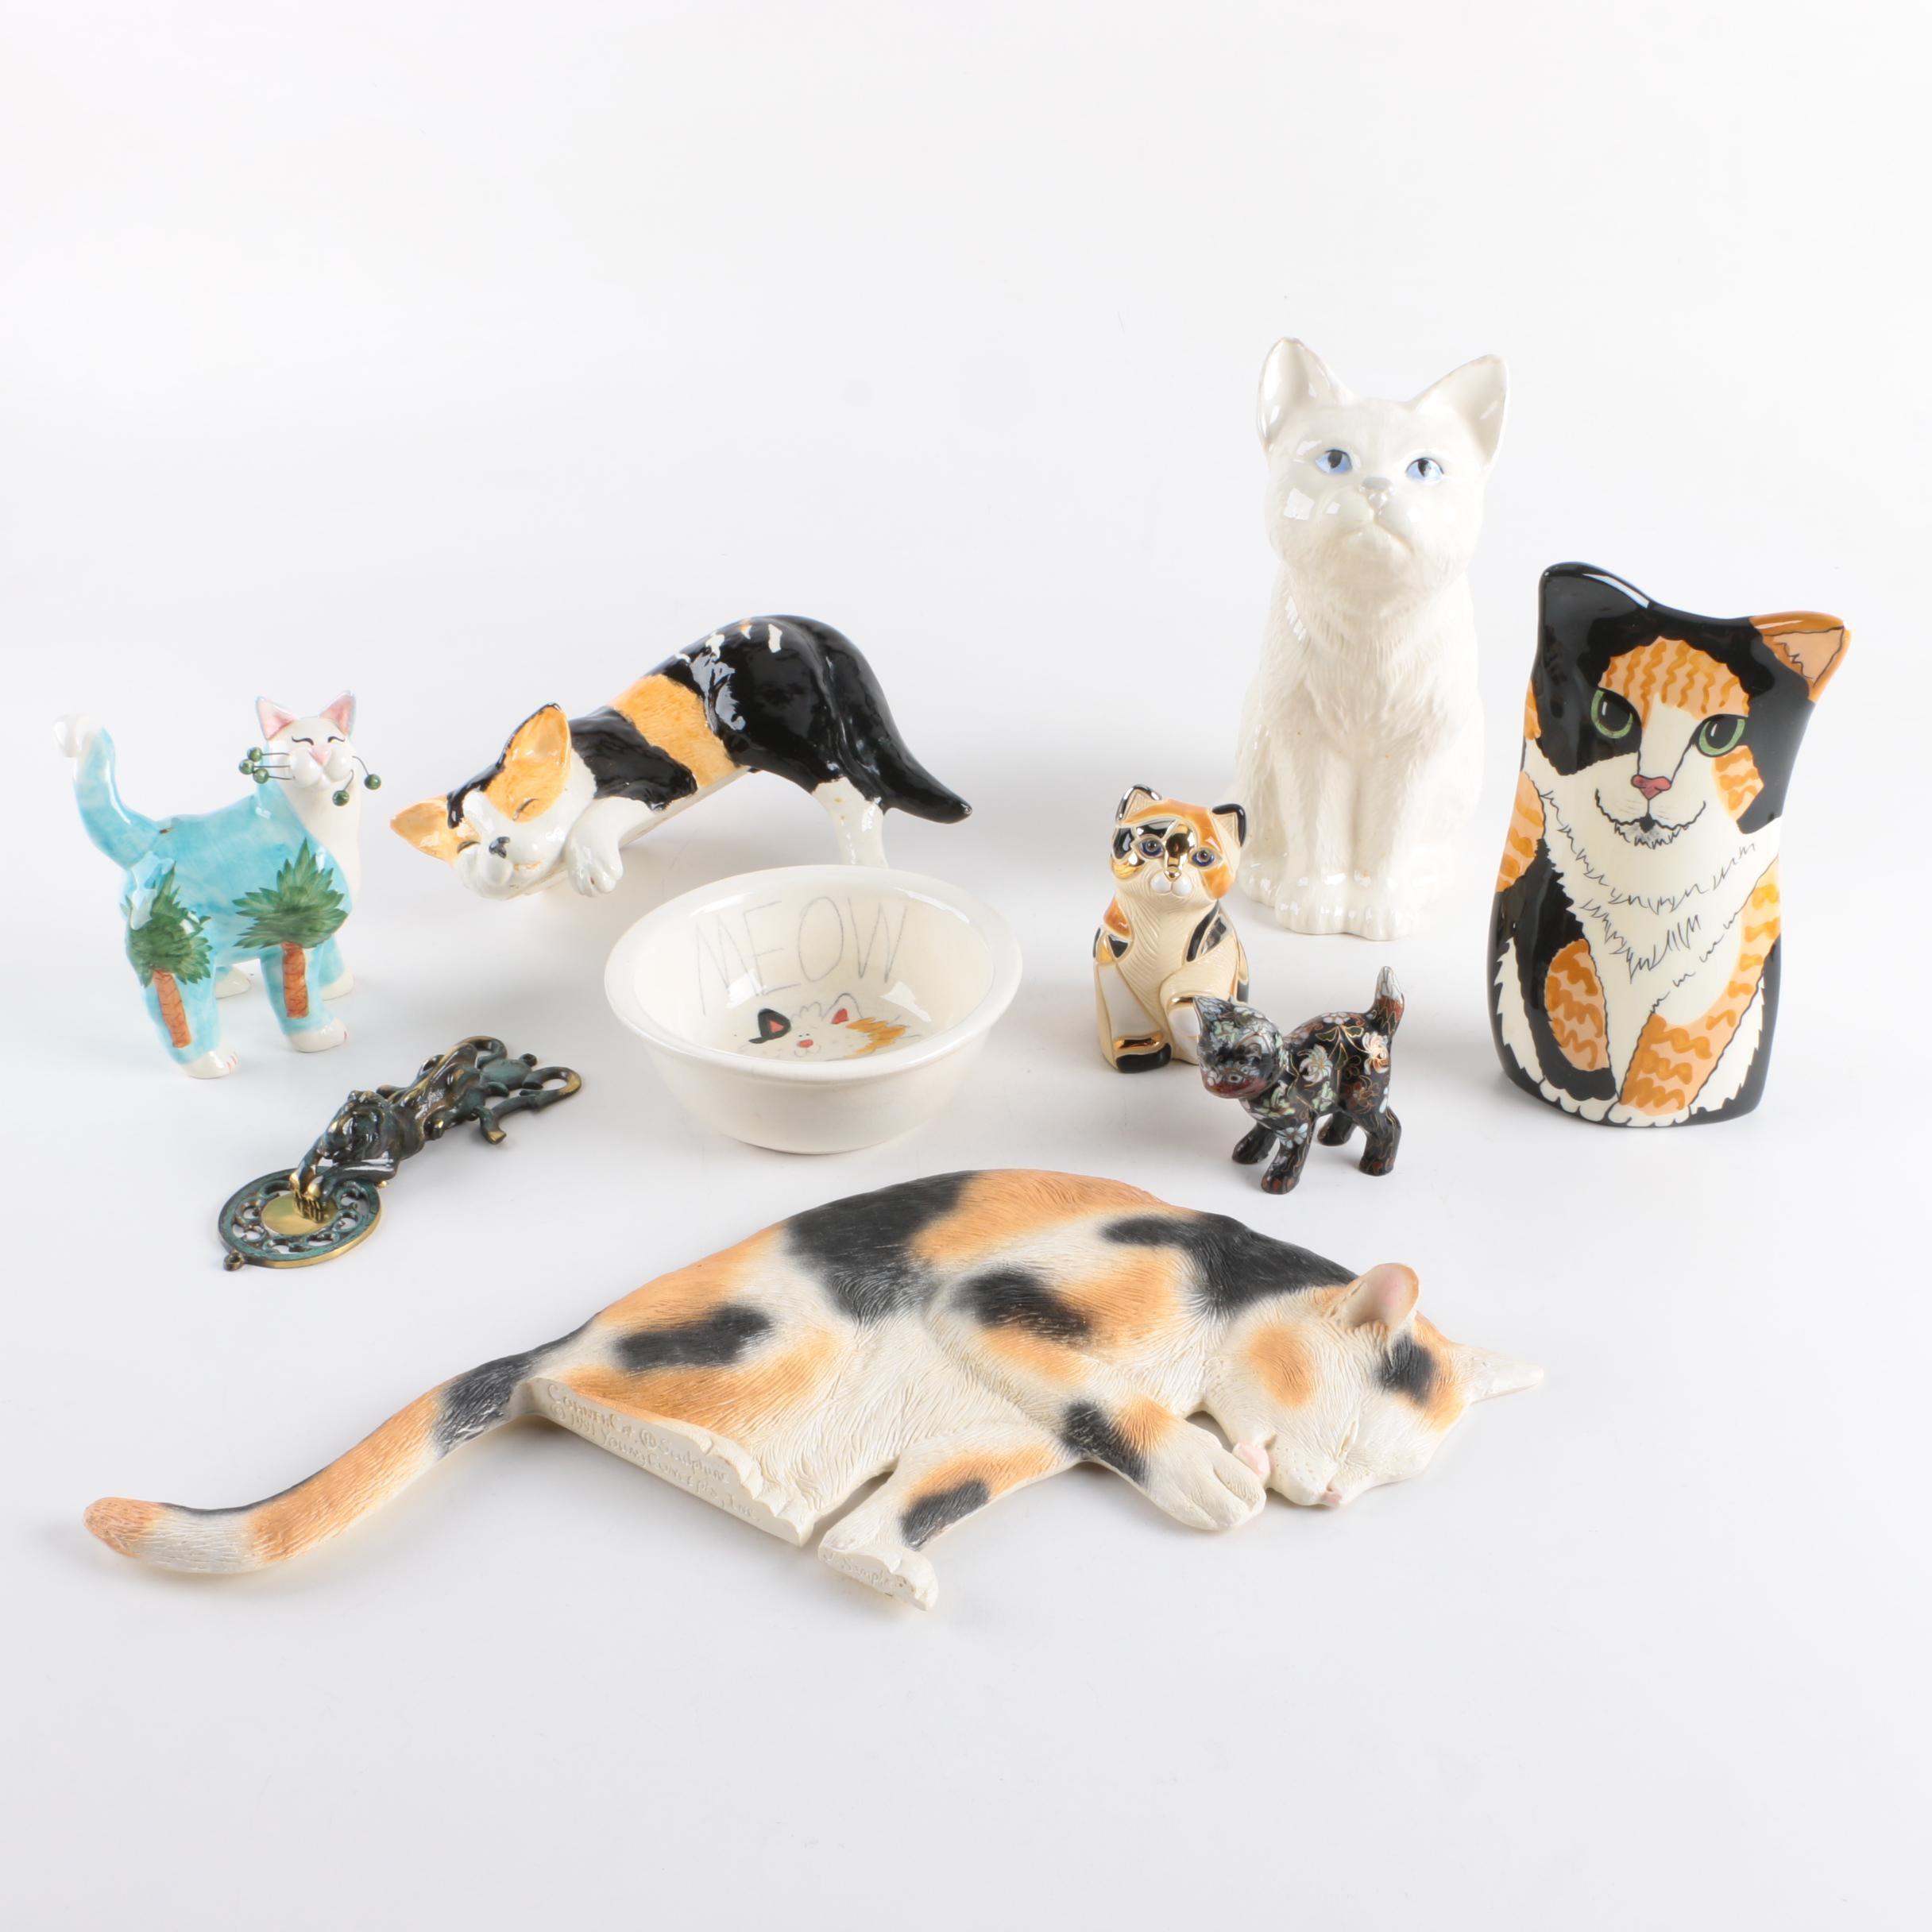 Feline Themed Figurines, Door Knocker and Bowl